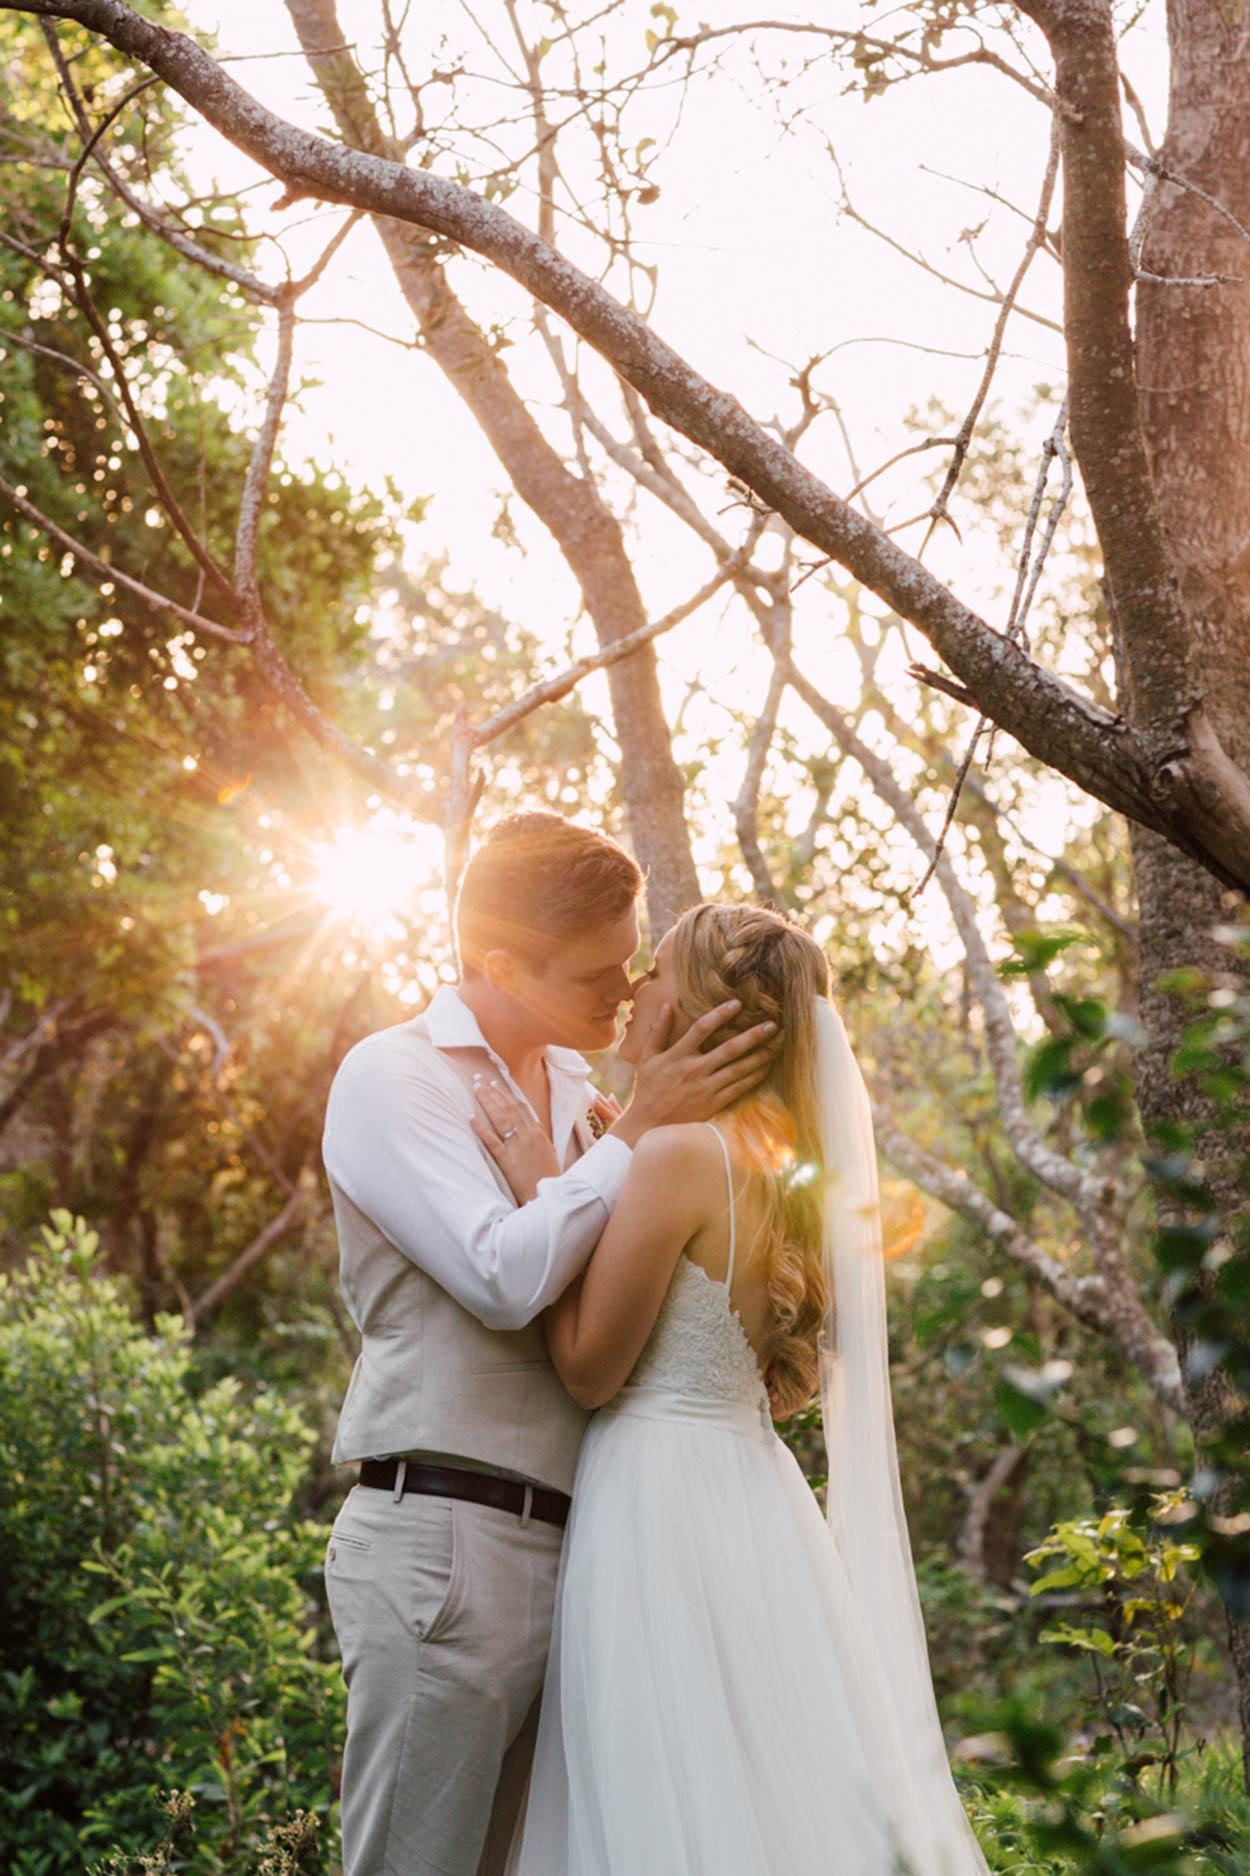 Best Noosa, Maleny Hinterland Pre Destination Wedding Photographers, Sunshine Coast - Queensland, Australian